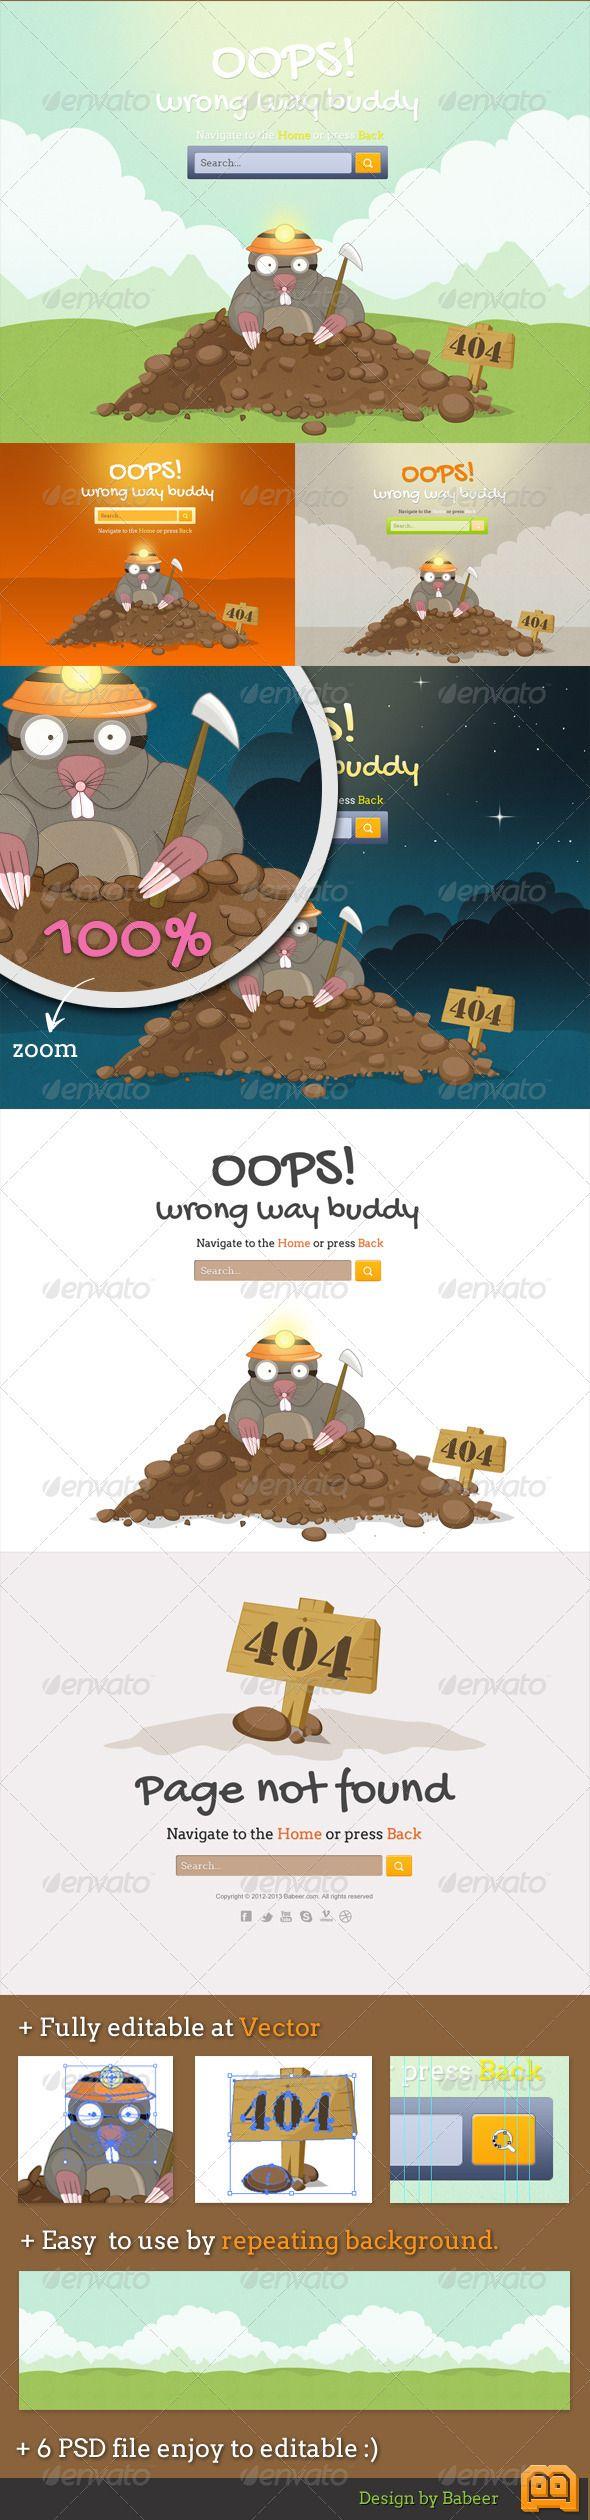 Mole 404 Error Pages